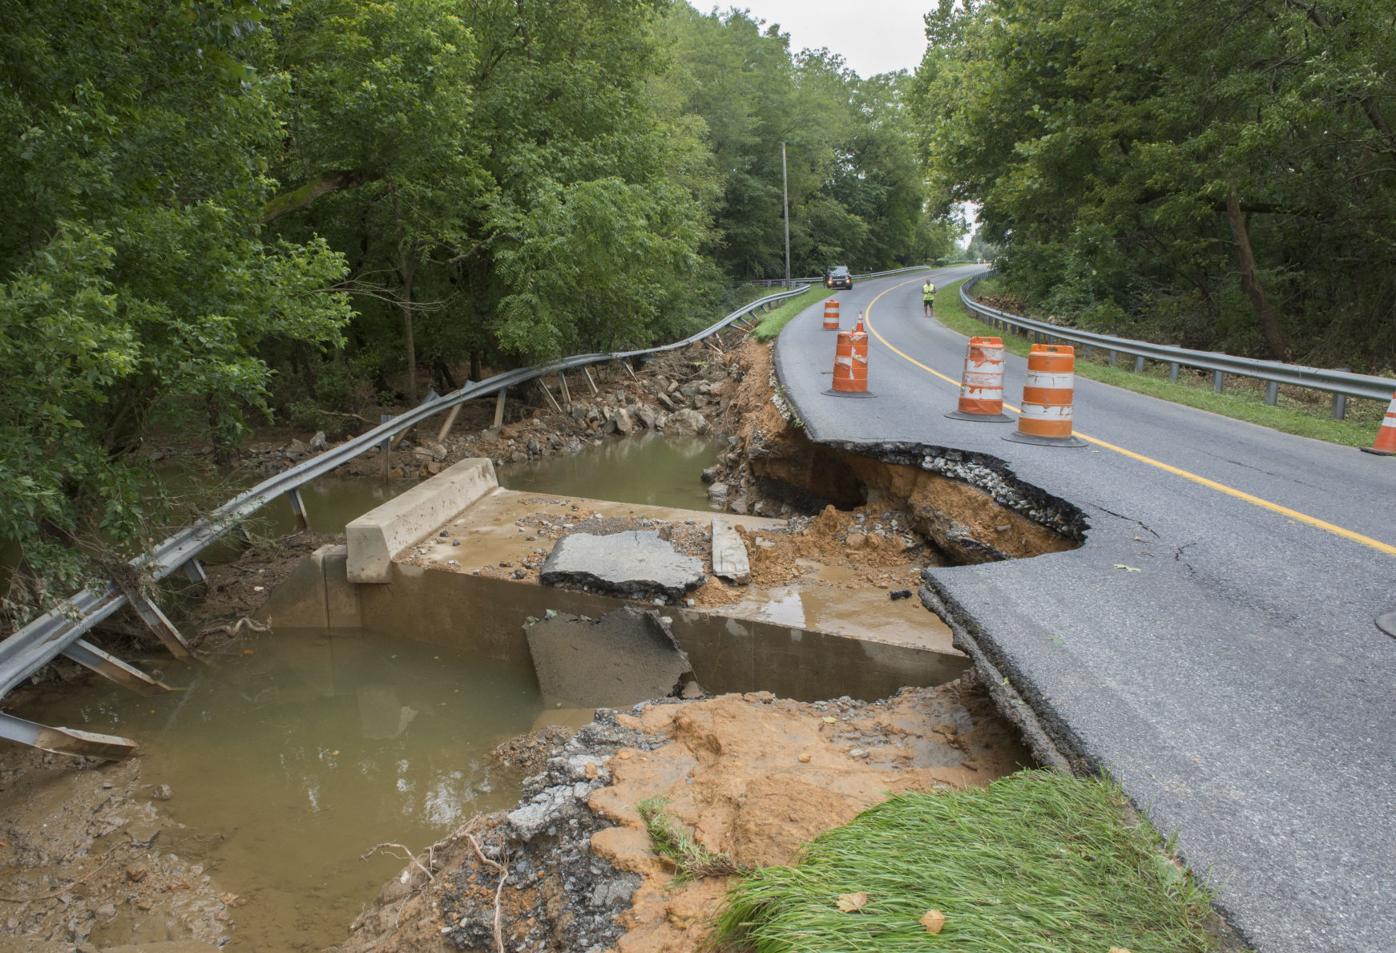 Flooding Aug 31